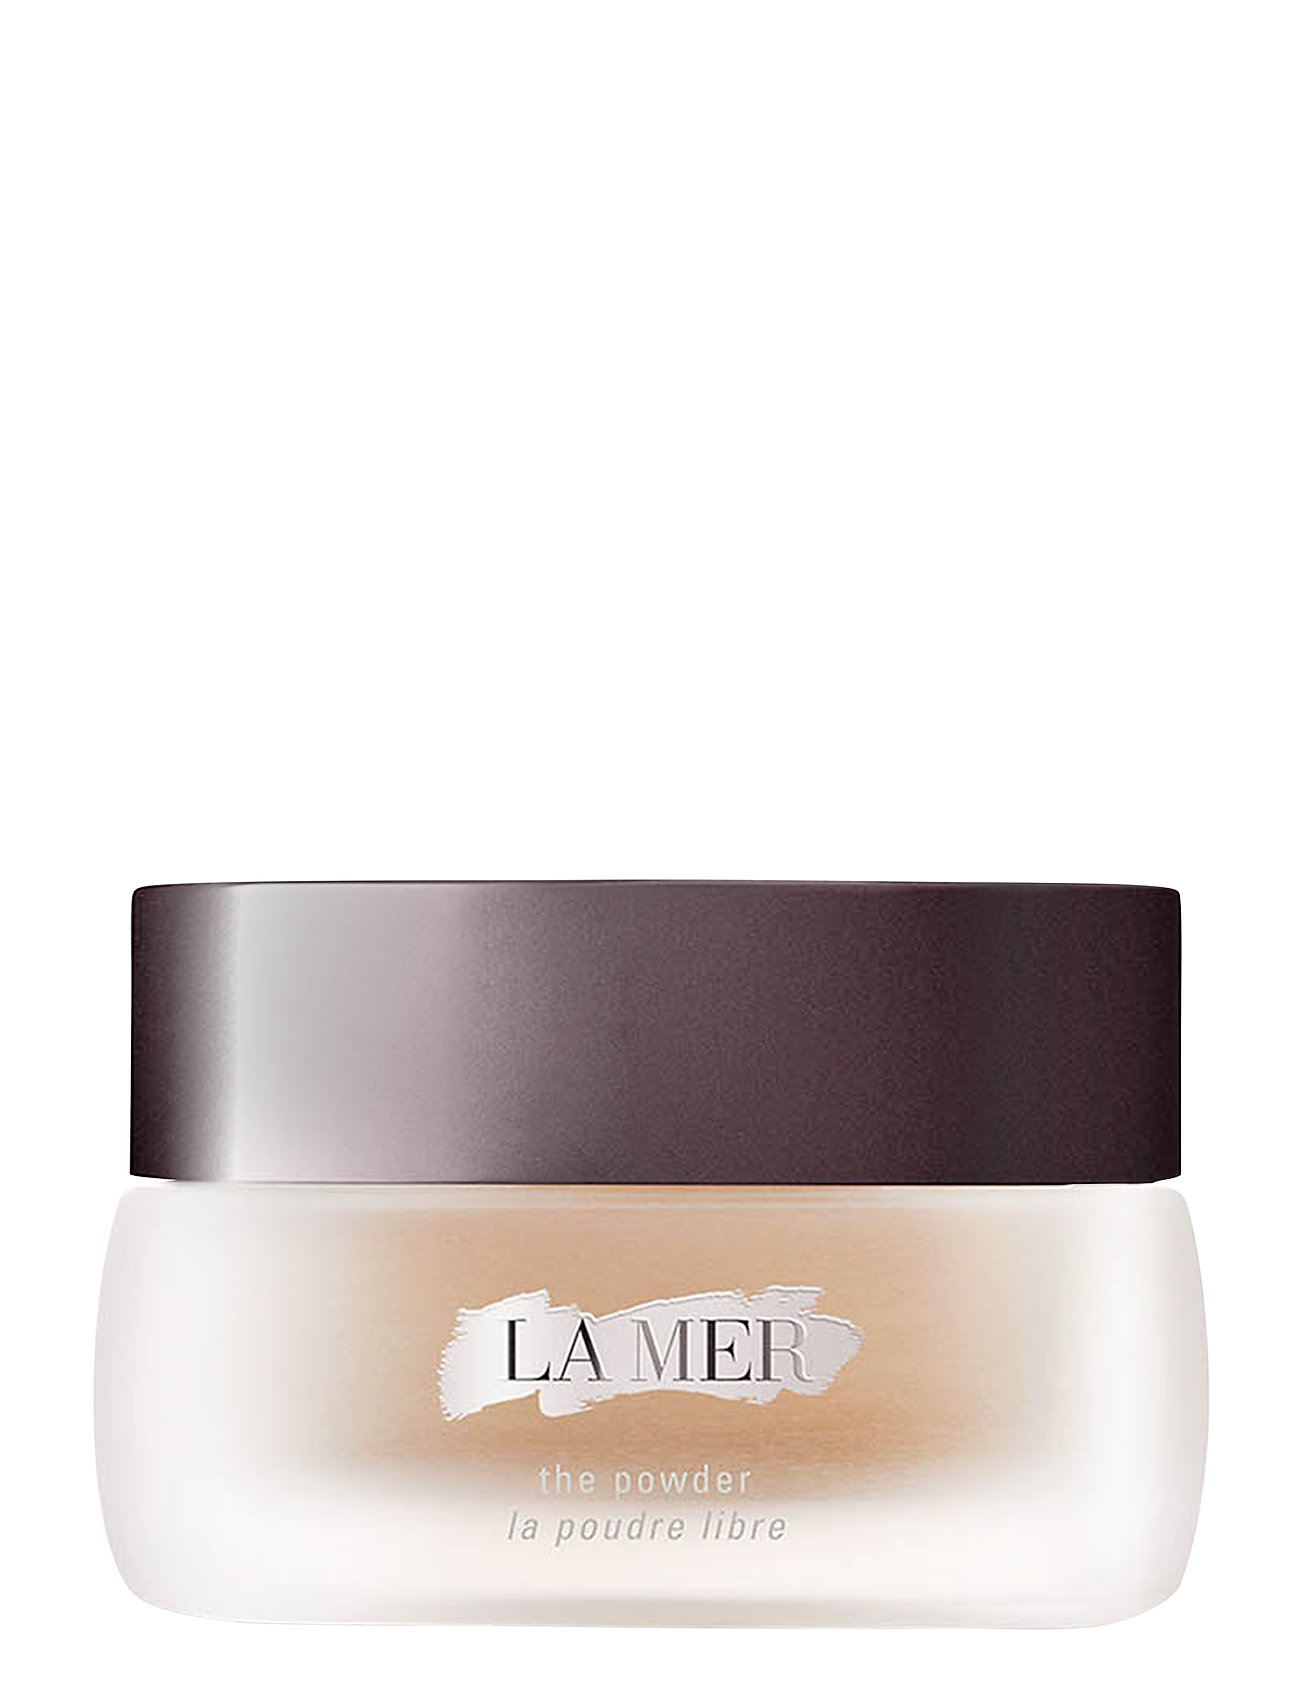 La Mer The Powder 8g - TRANSLUCENT